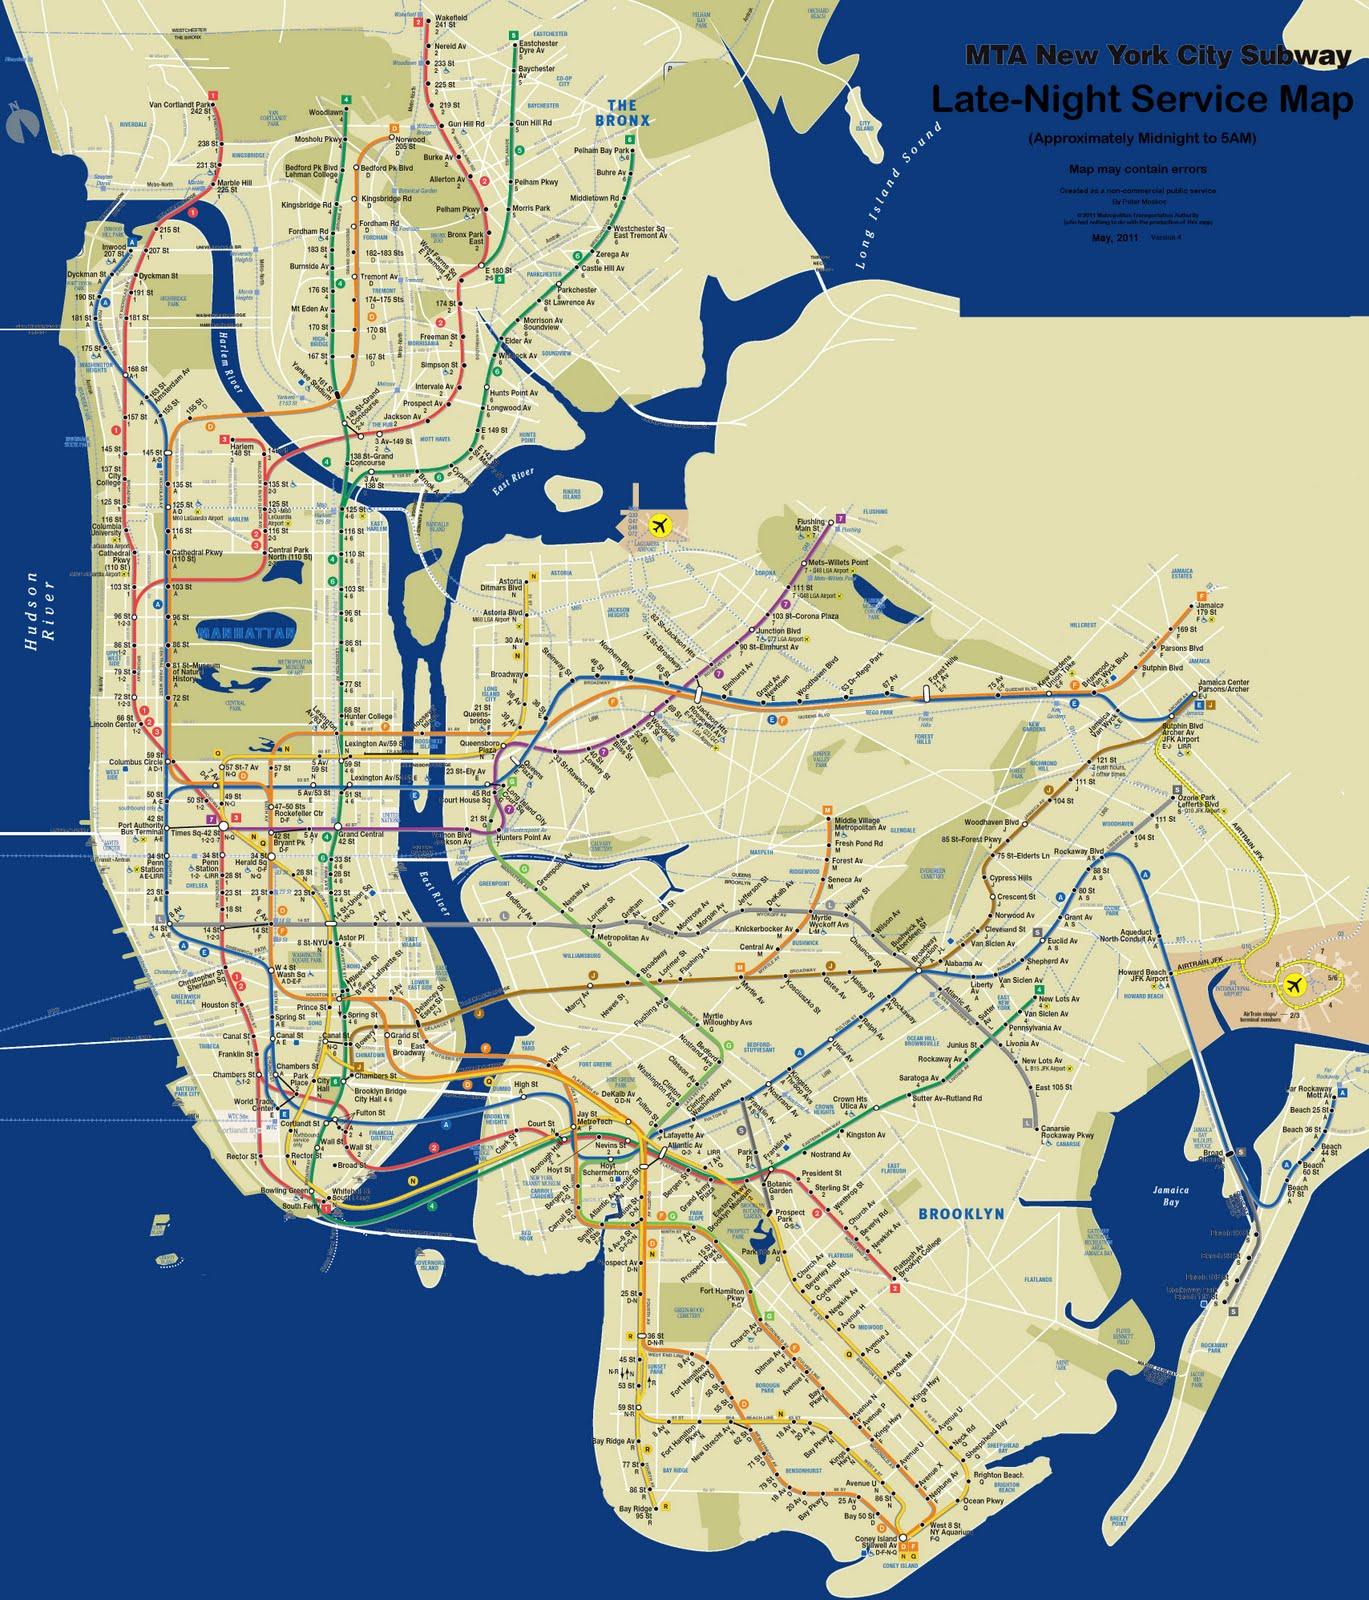 Astoria Nyc Map.Astoria Bike The First Late Night Nyc Subway Map